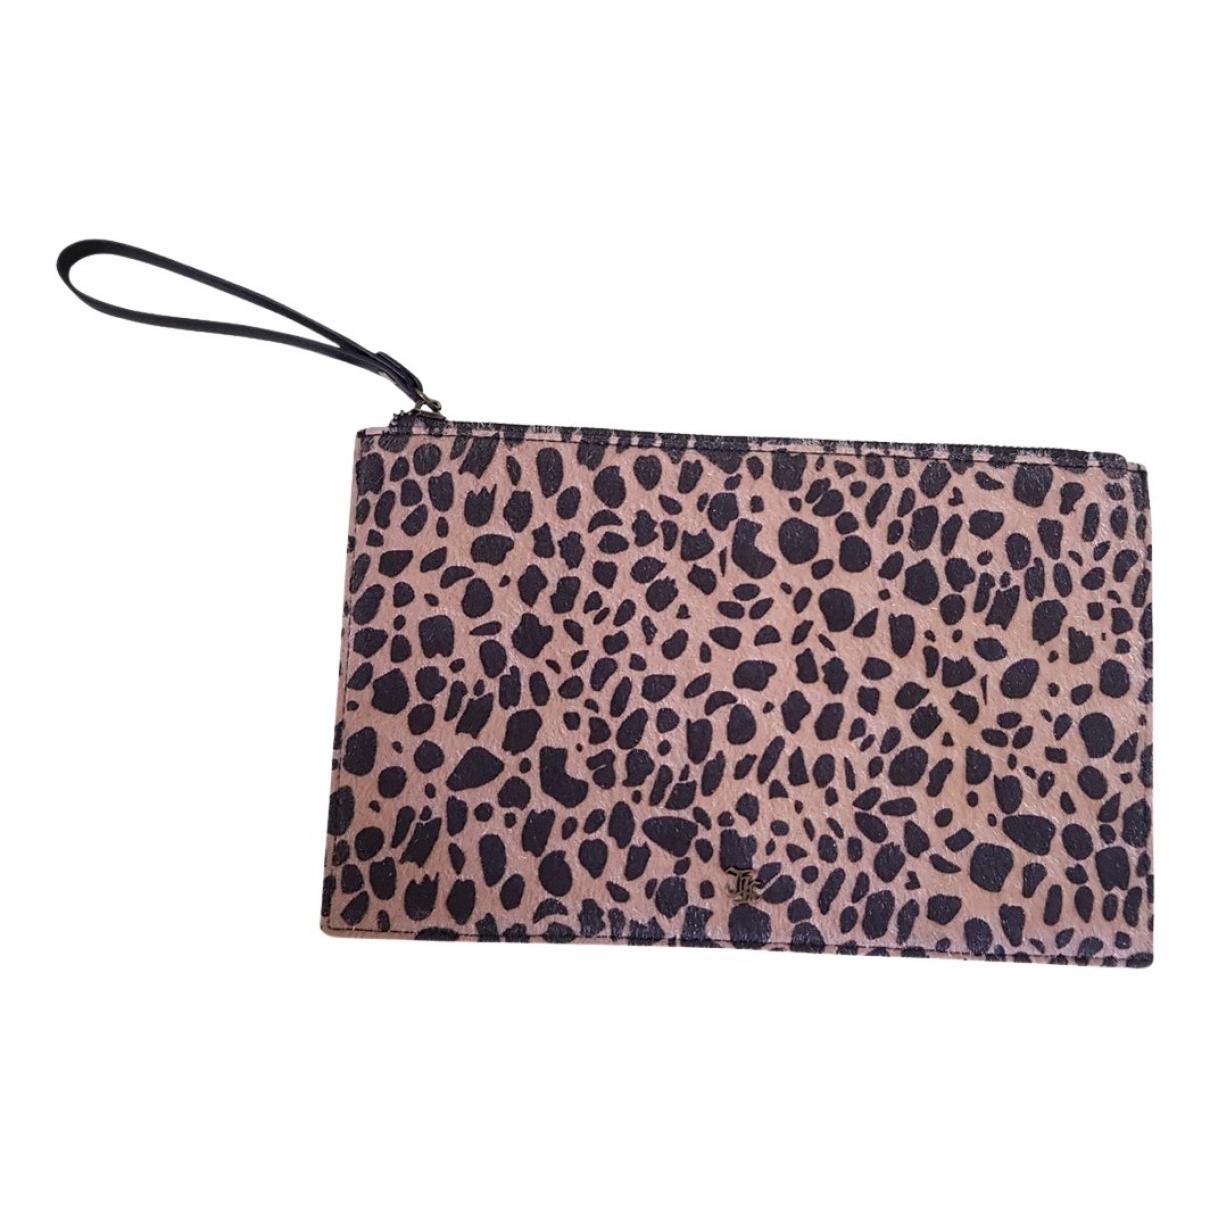 The Kooples N Multicolour Clutch bag for Women N